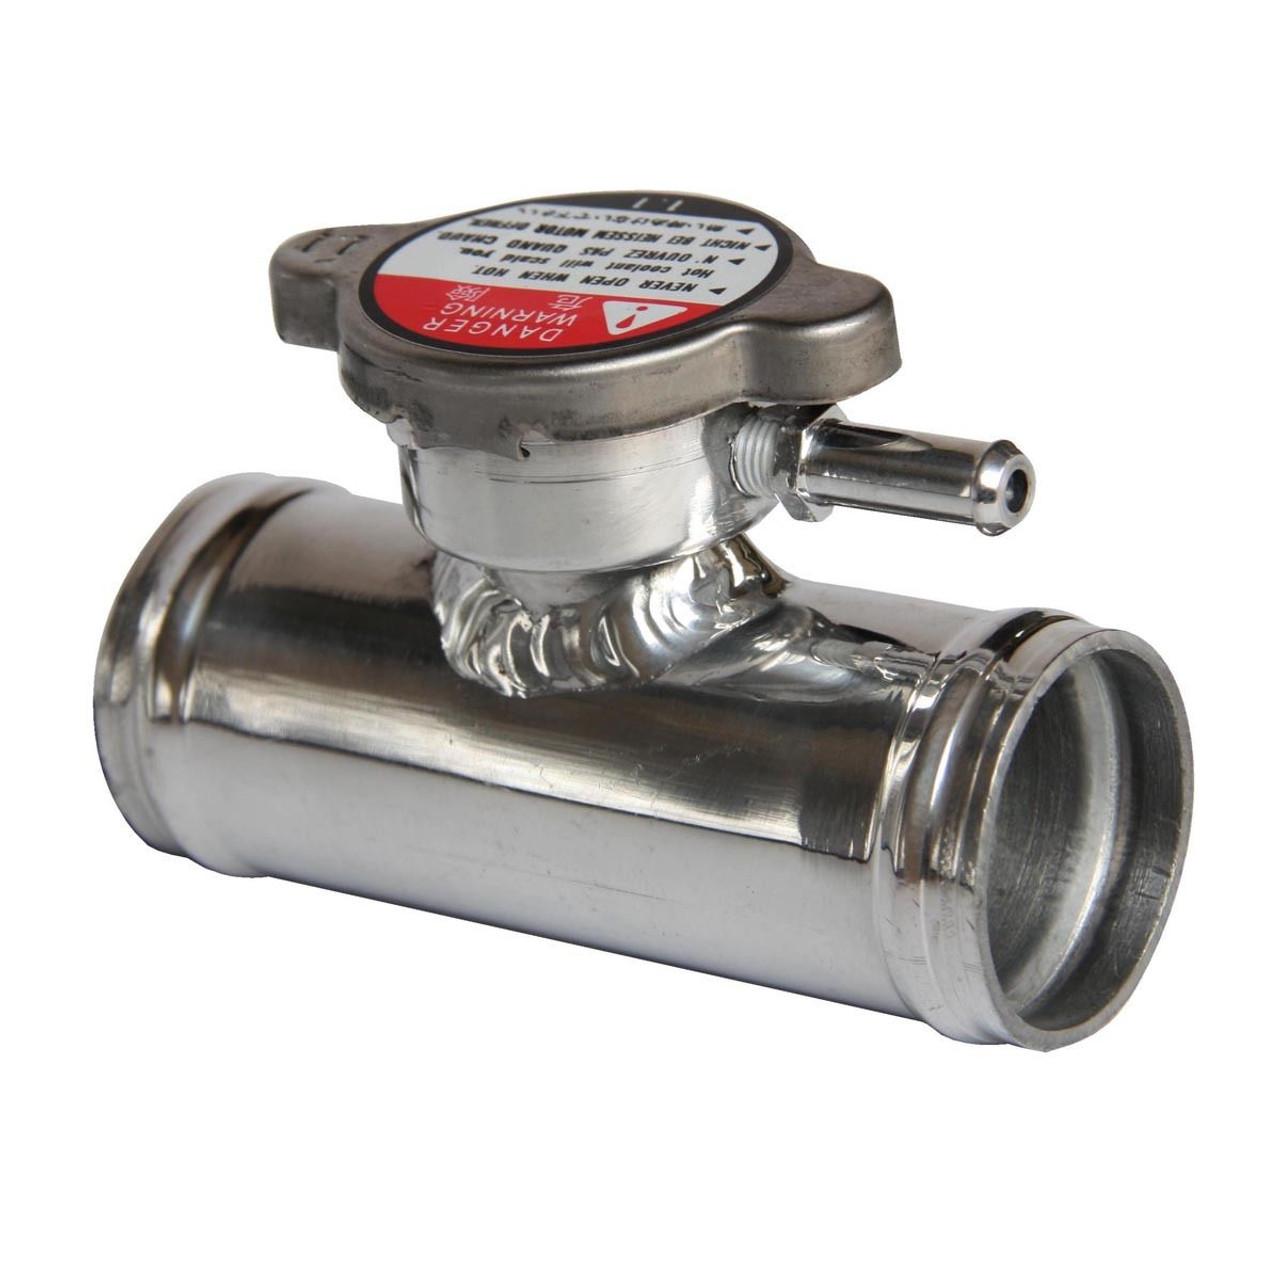 32mm 1 4 Billet Aluminum In Line Radiator Hose Filler Neck Cap Kia Coolant Connector Inlet Splice Straight Orfice Overflow Vent Tube 5